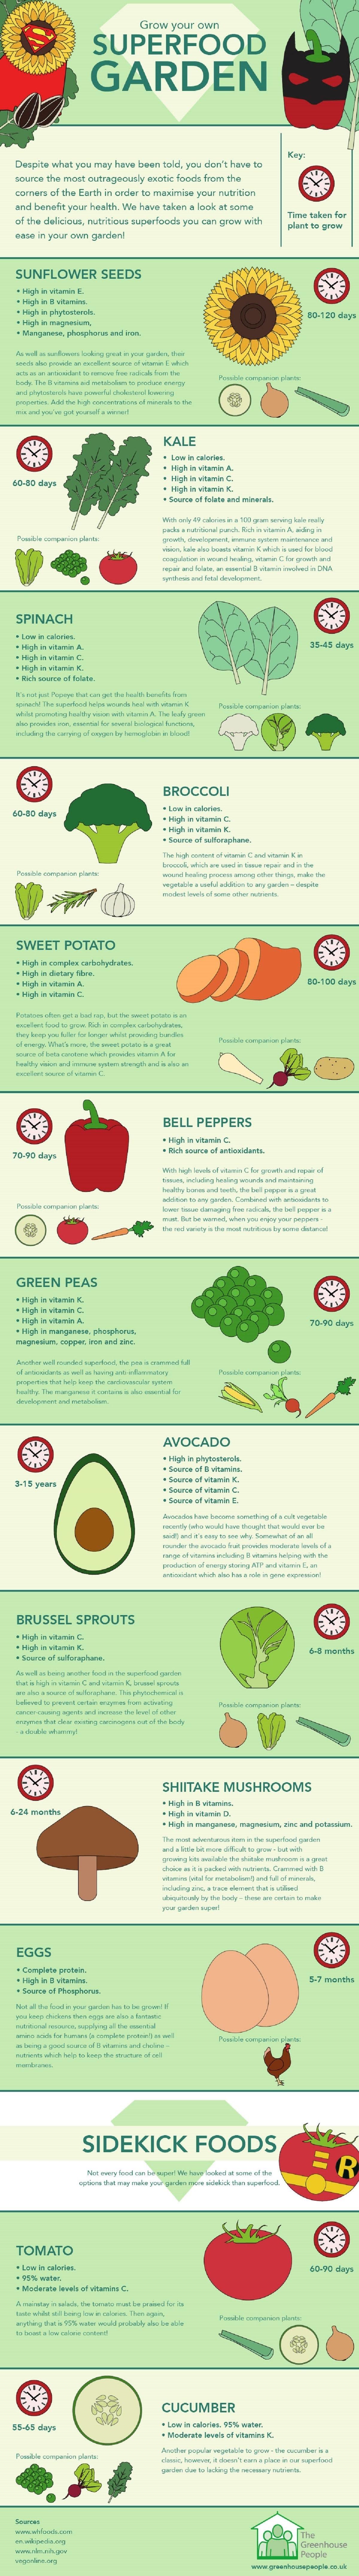 Superfood Garden #infographic